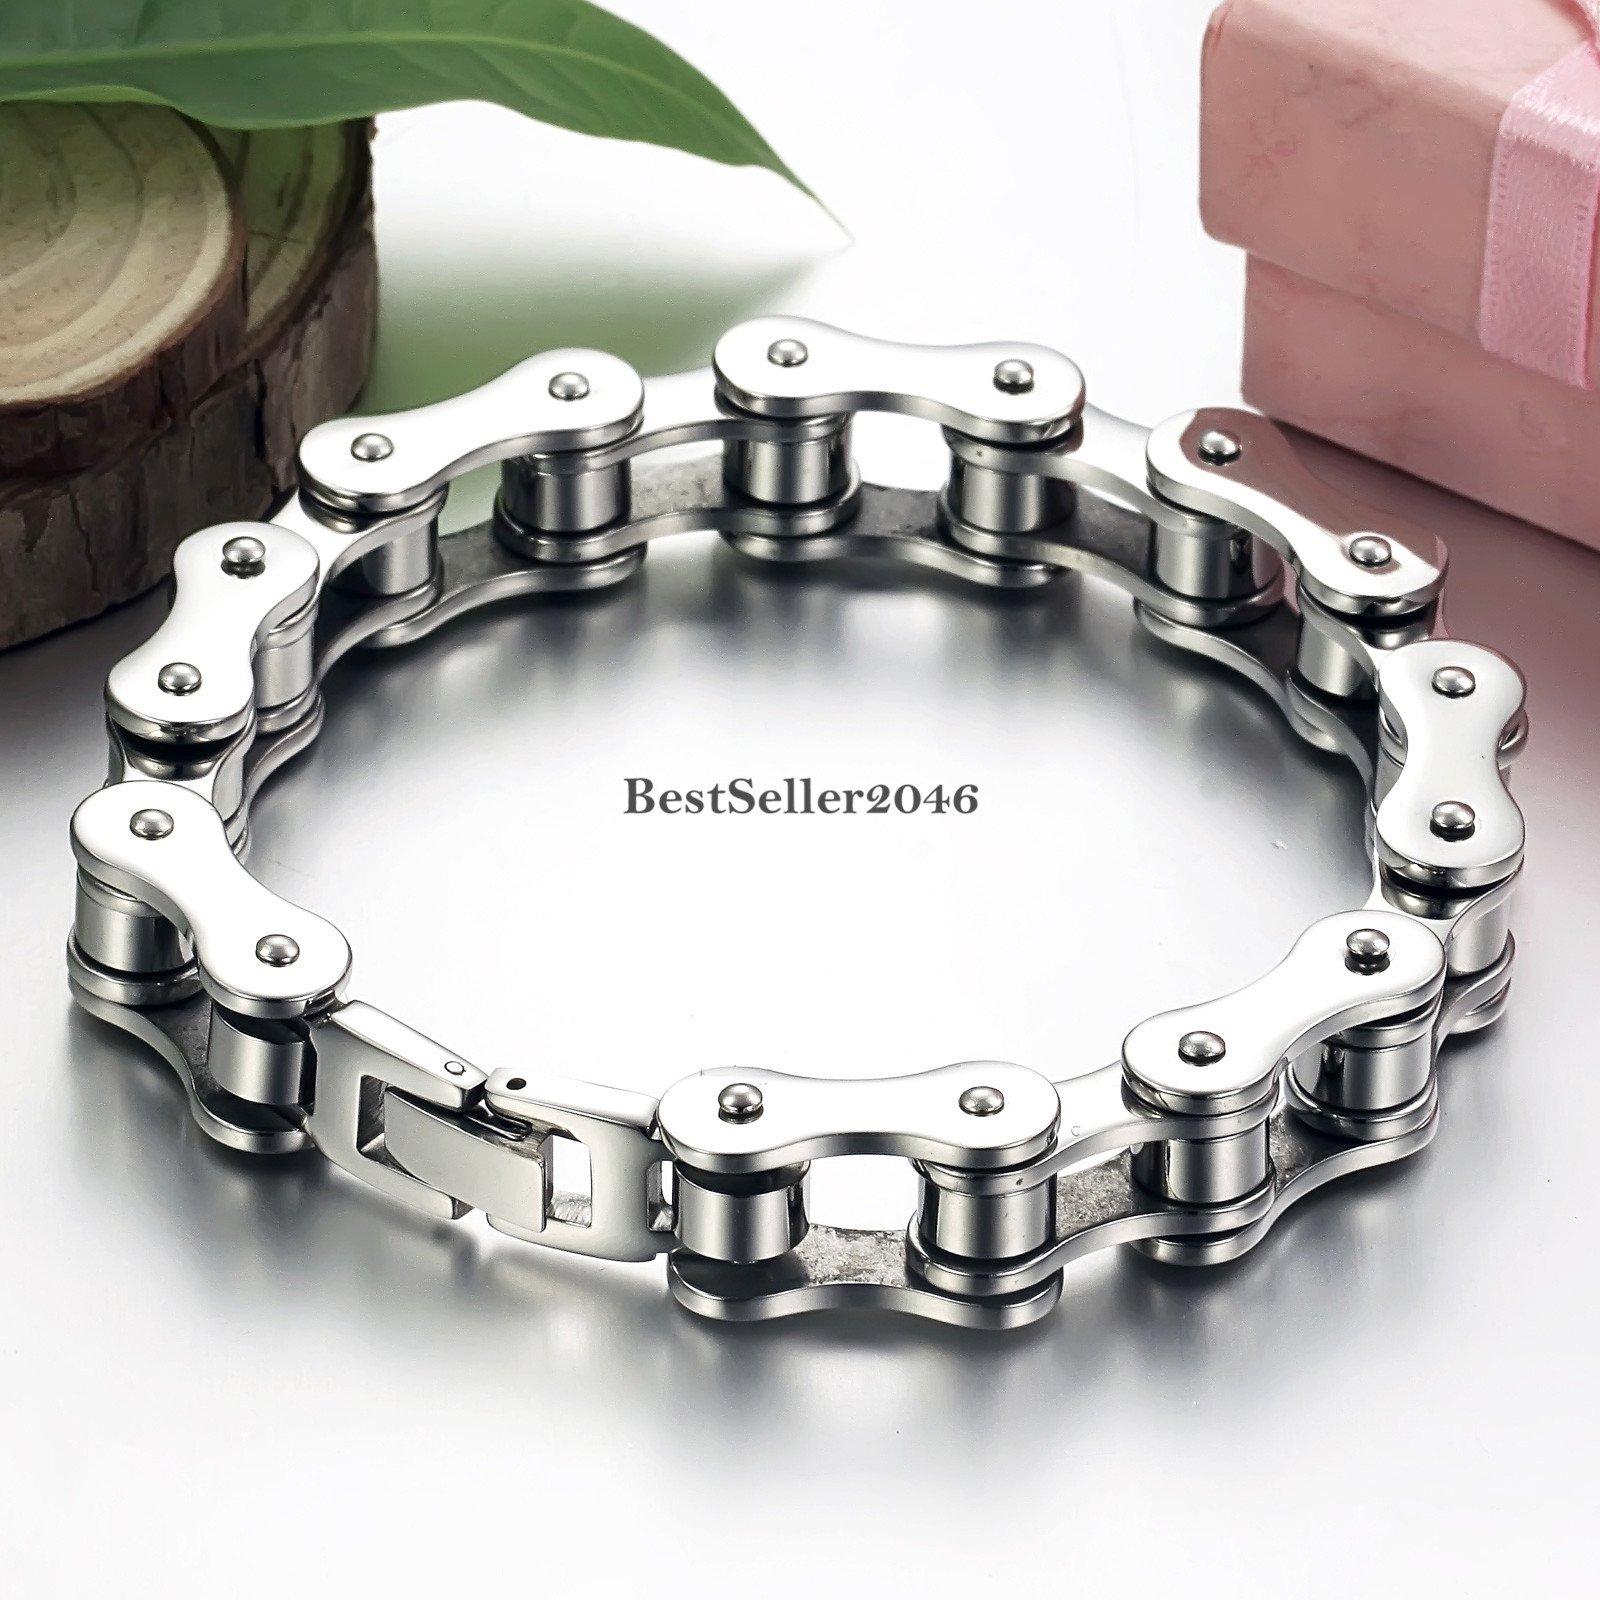 Motorcycle Biker Chain Bracelet Men's Heavy Silver Stainless Steel 8 Inch Bangle